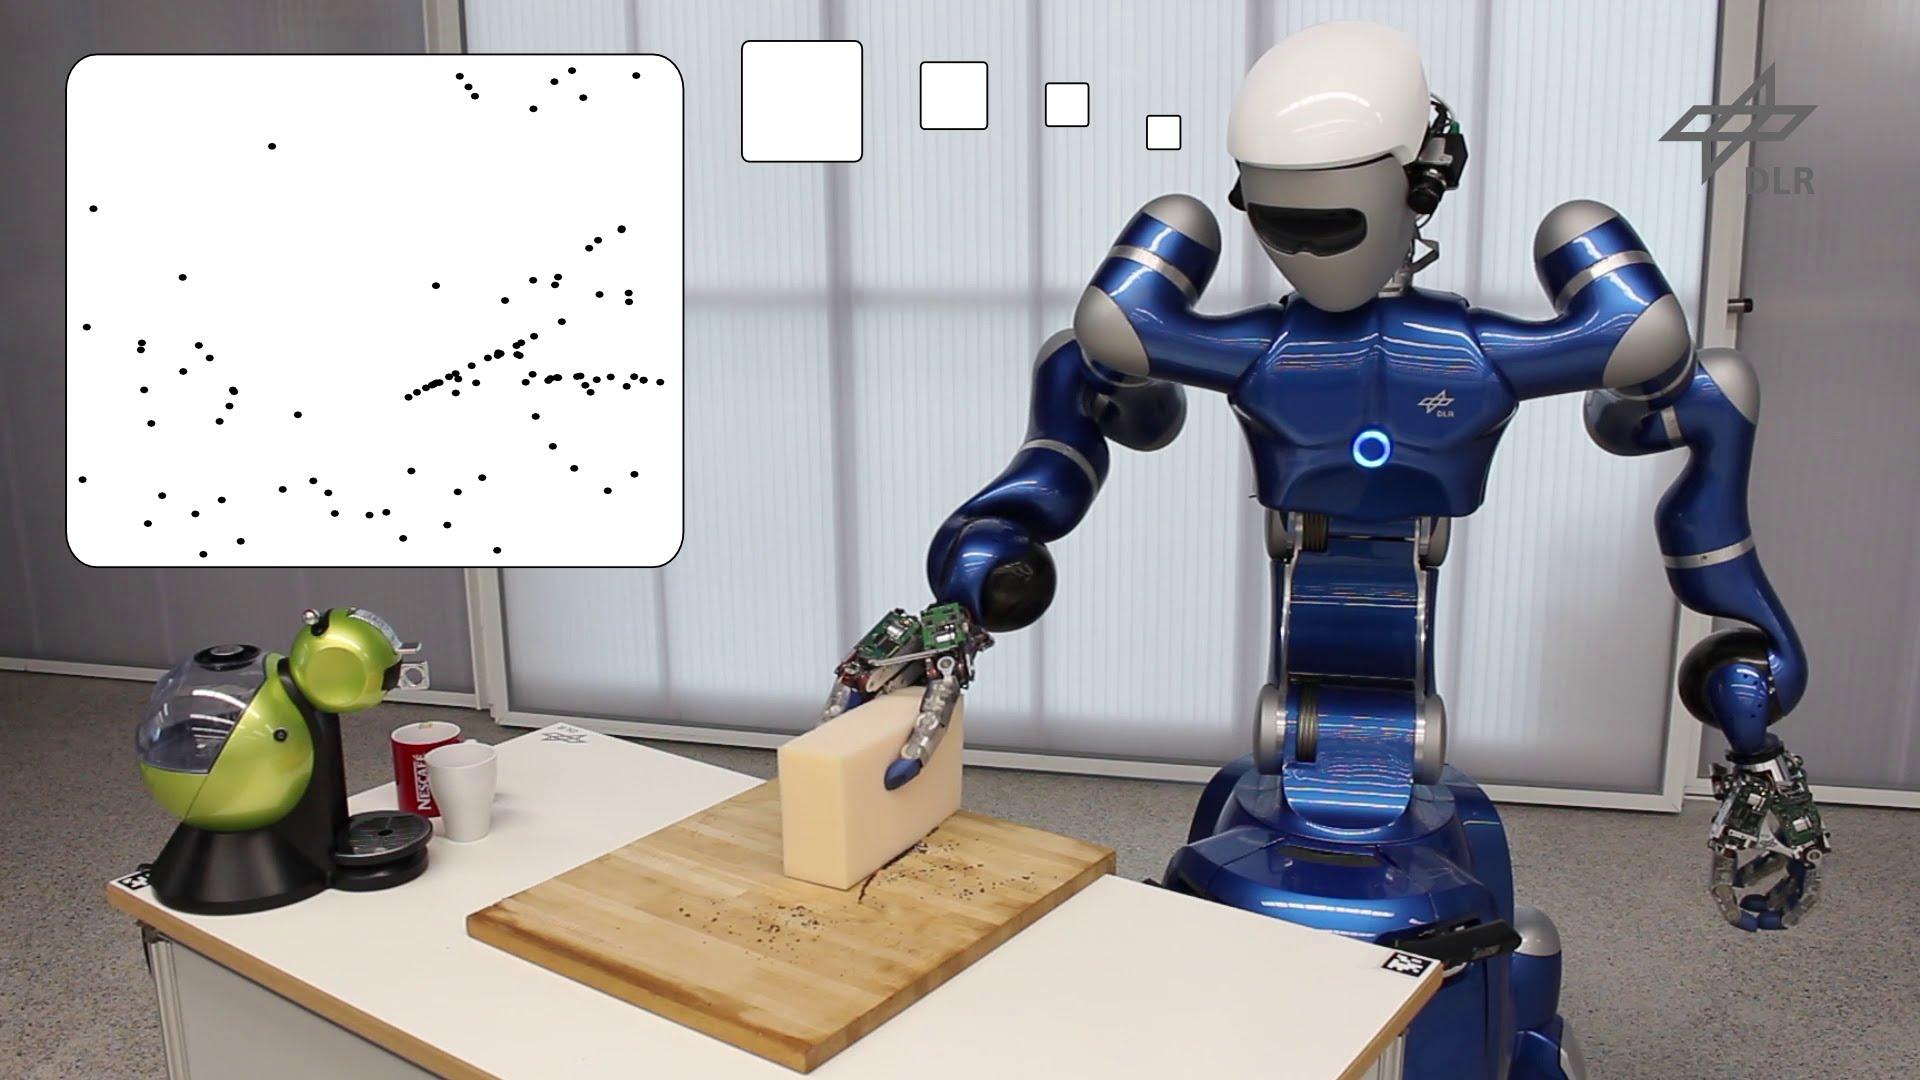 Service robotics